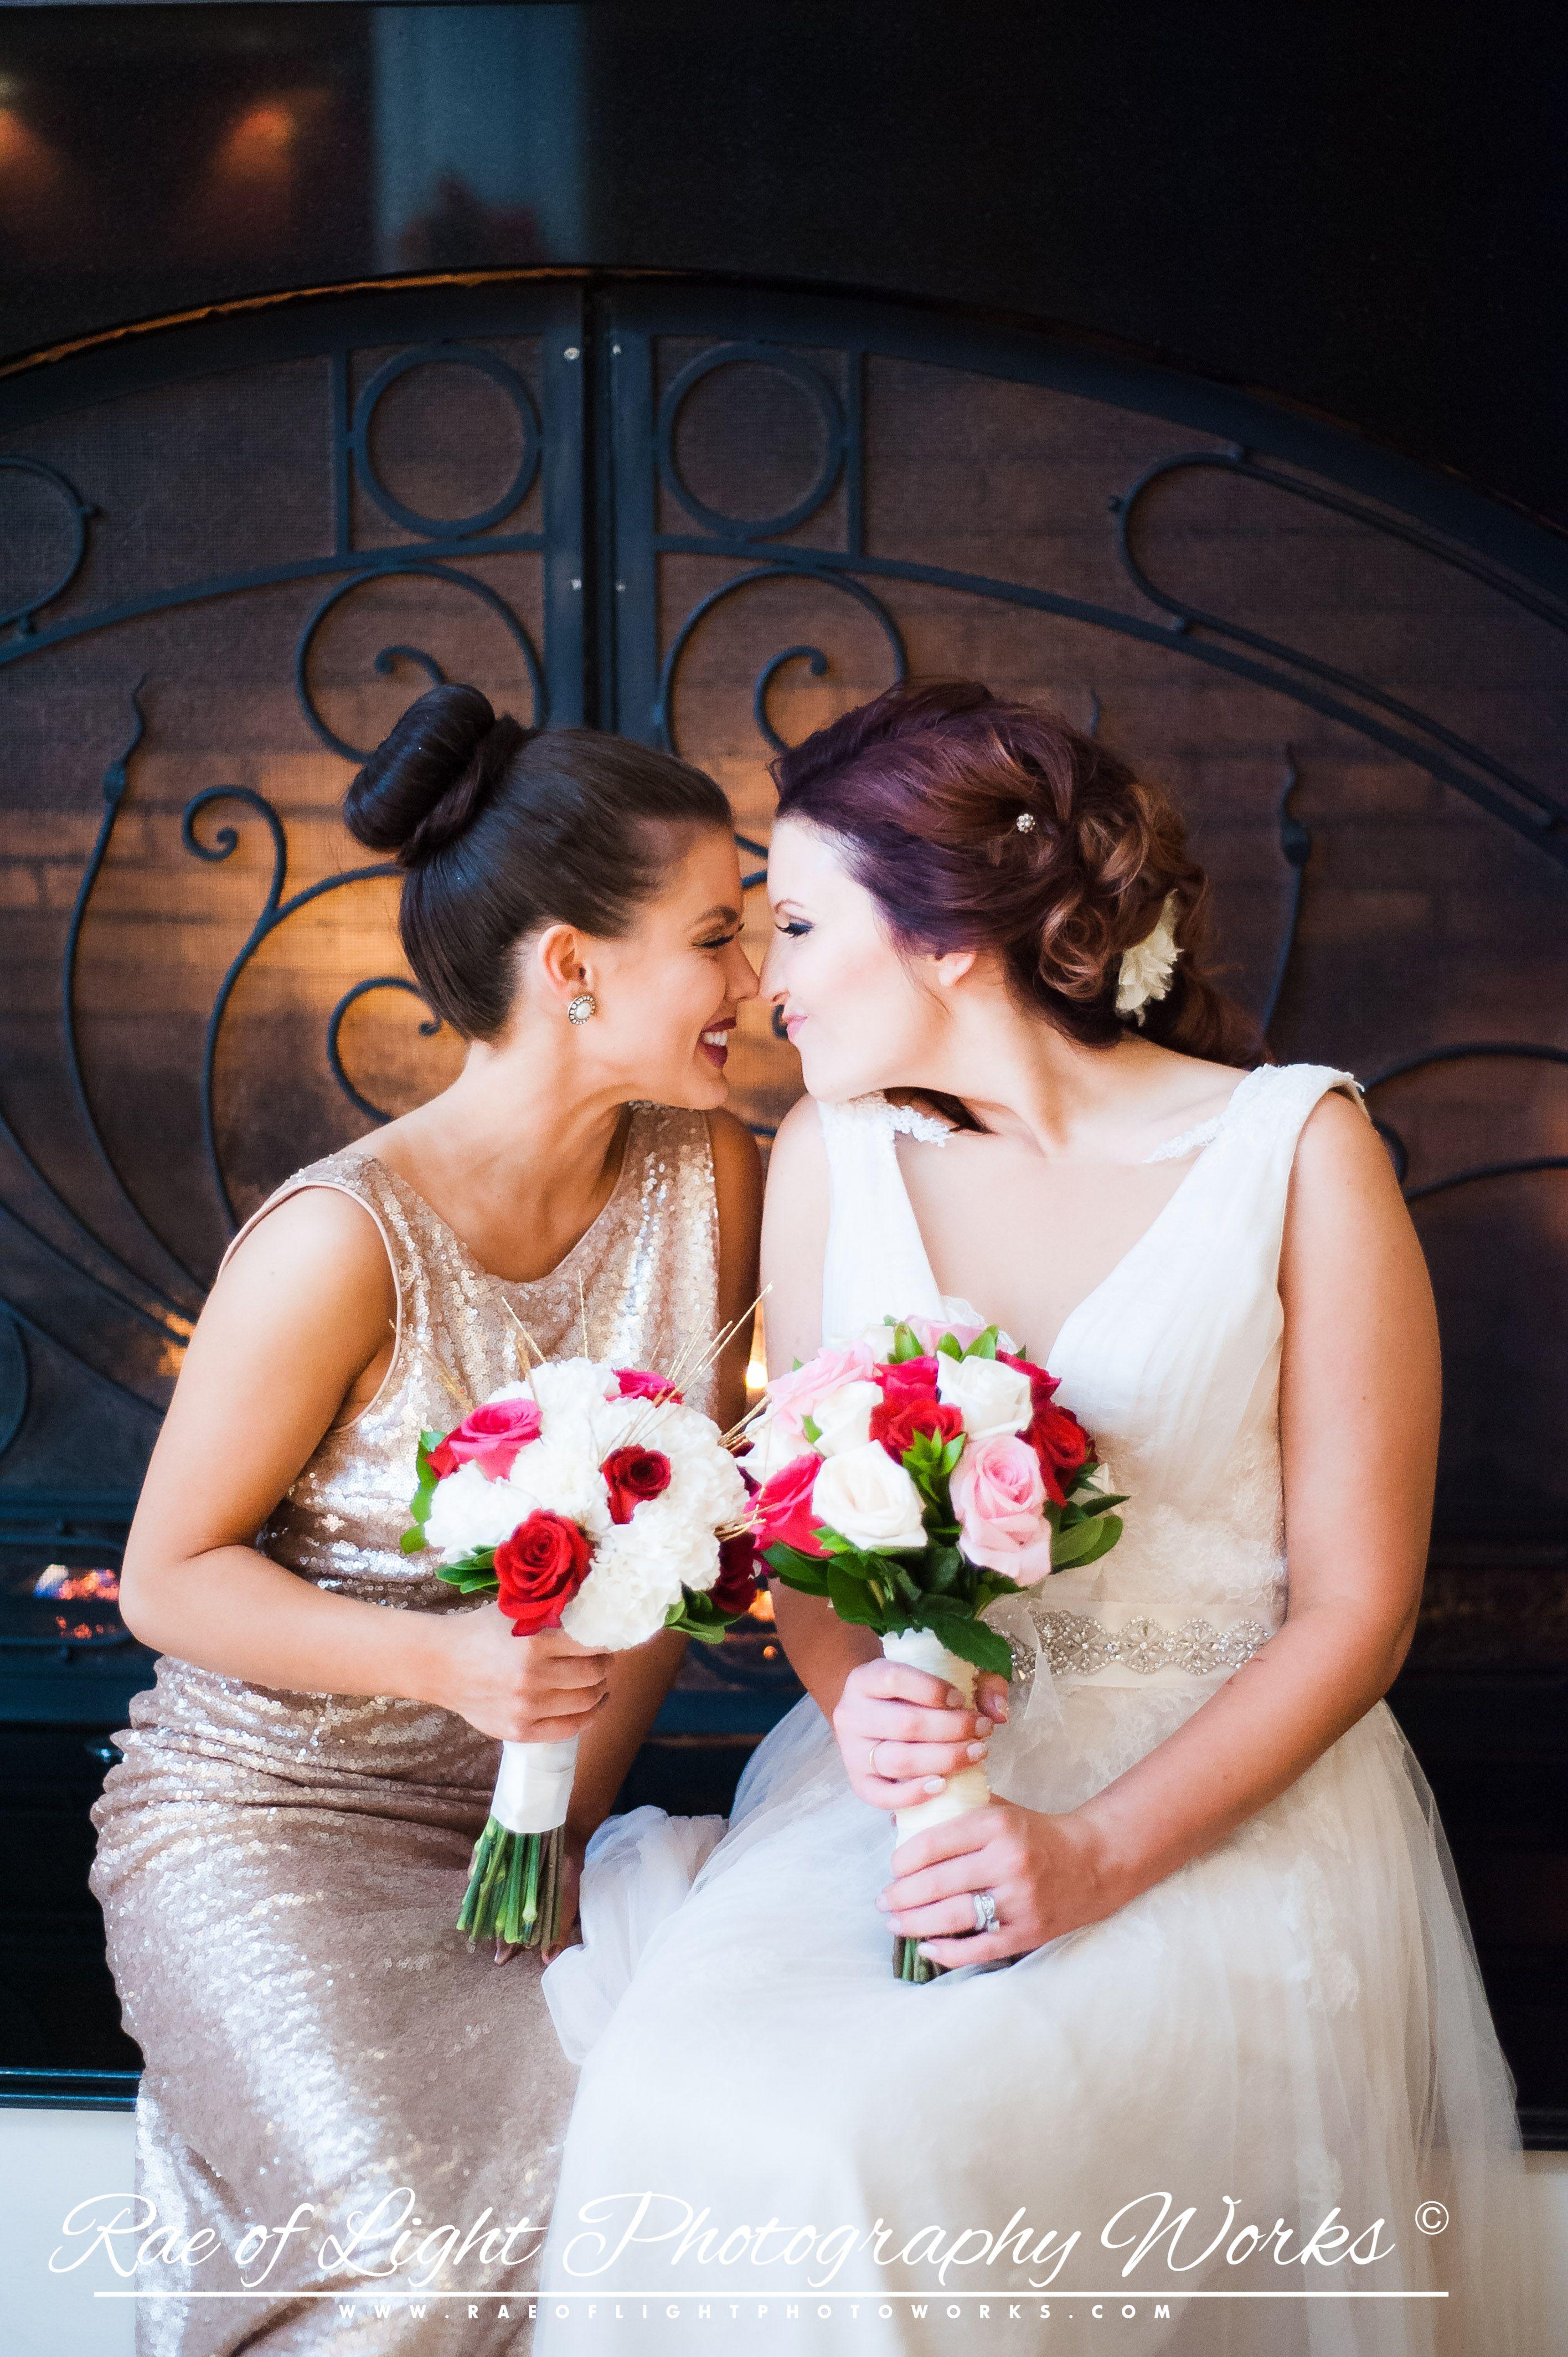 Opryland Hotel Wedding  #opryland #wedding #bridal #photography #weddingphotography #raeoflightphotography  www.raeoflighphotoworks.com #bestfriends #bestfriendphoto